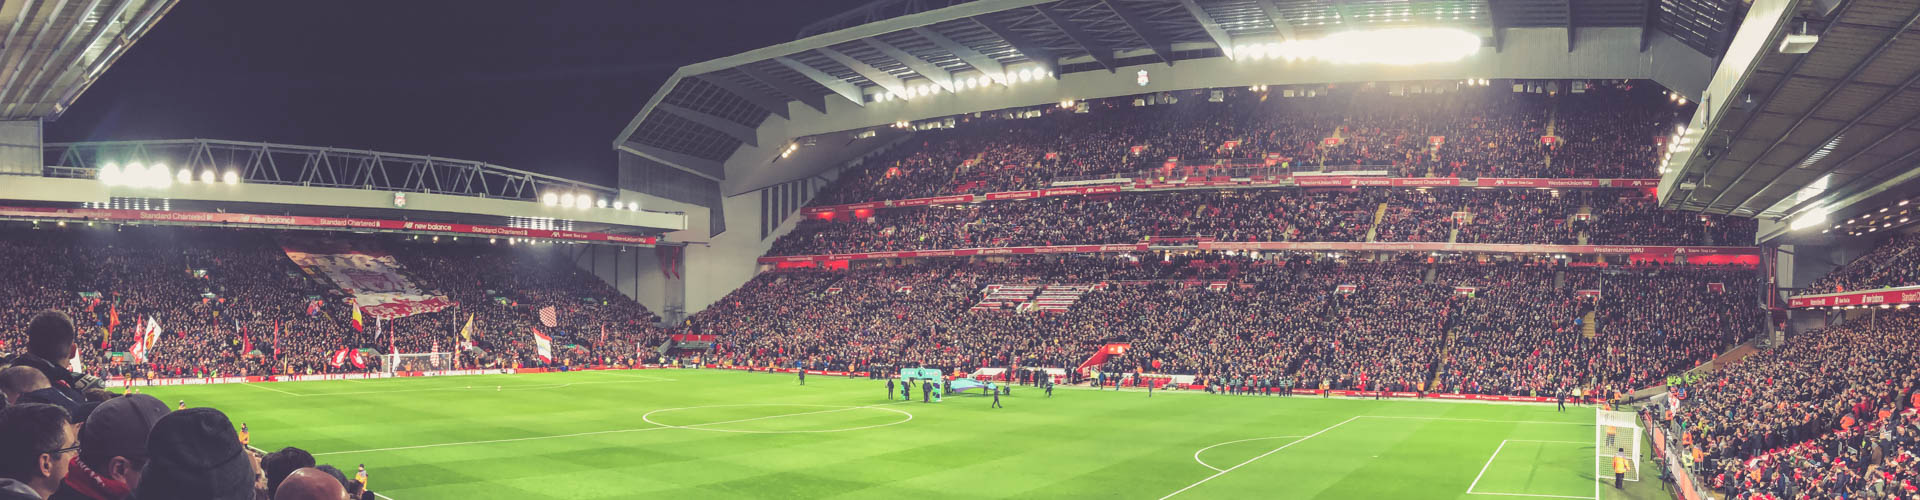 Anfield Road, Liverpool - Flutlicht Panorama